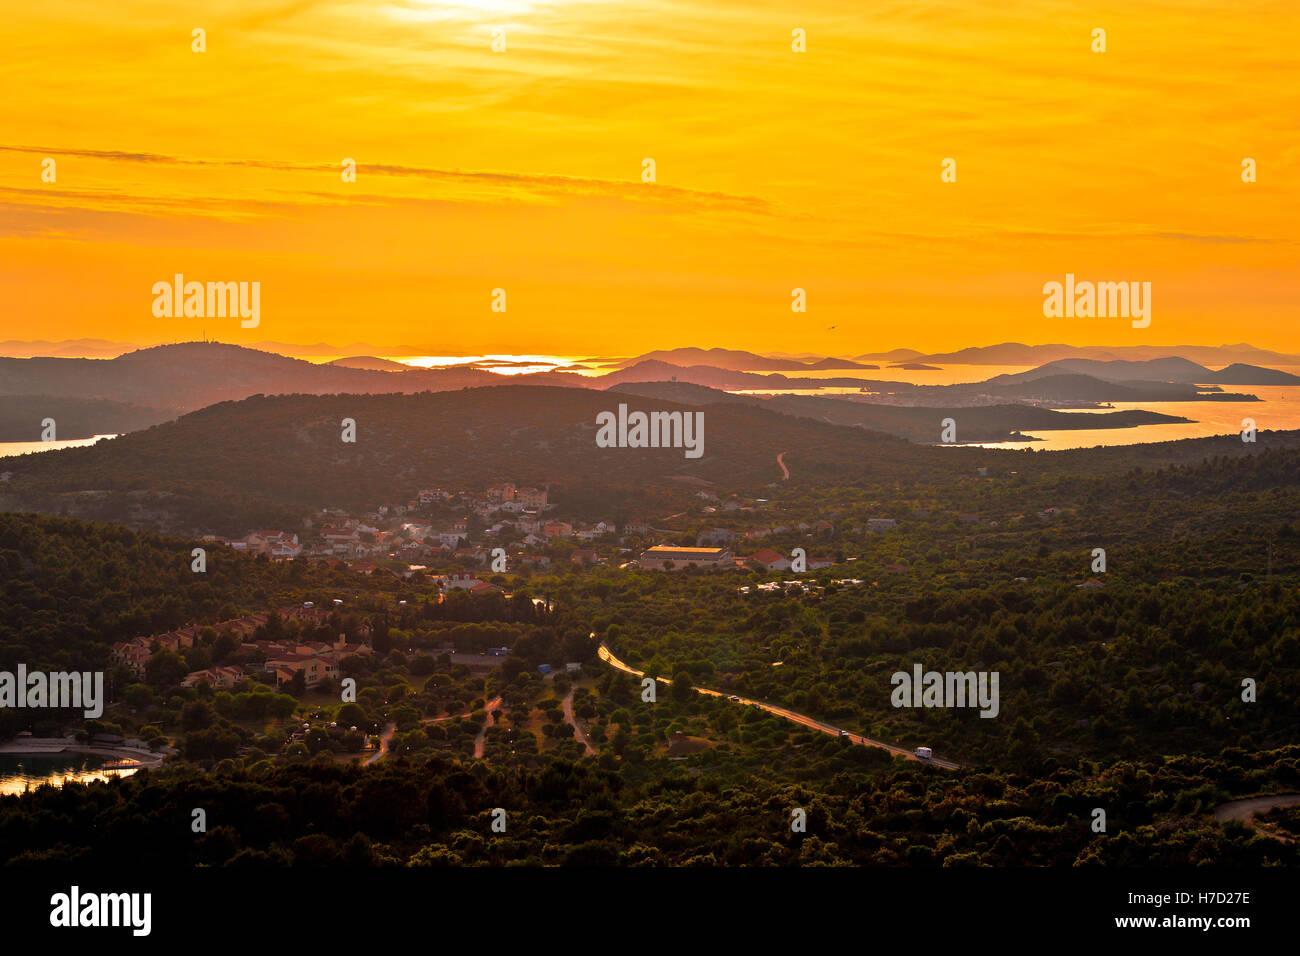 Island of Murter and Adriatic archipelago yellow sunset aerial view, Dalmatia, Croatia - Stock Image